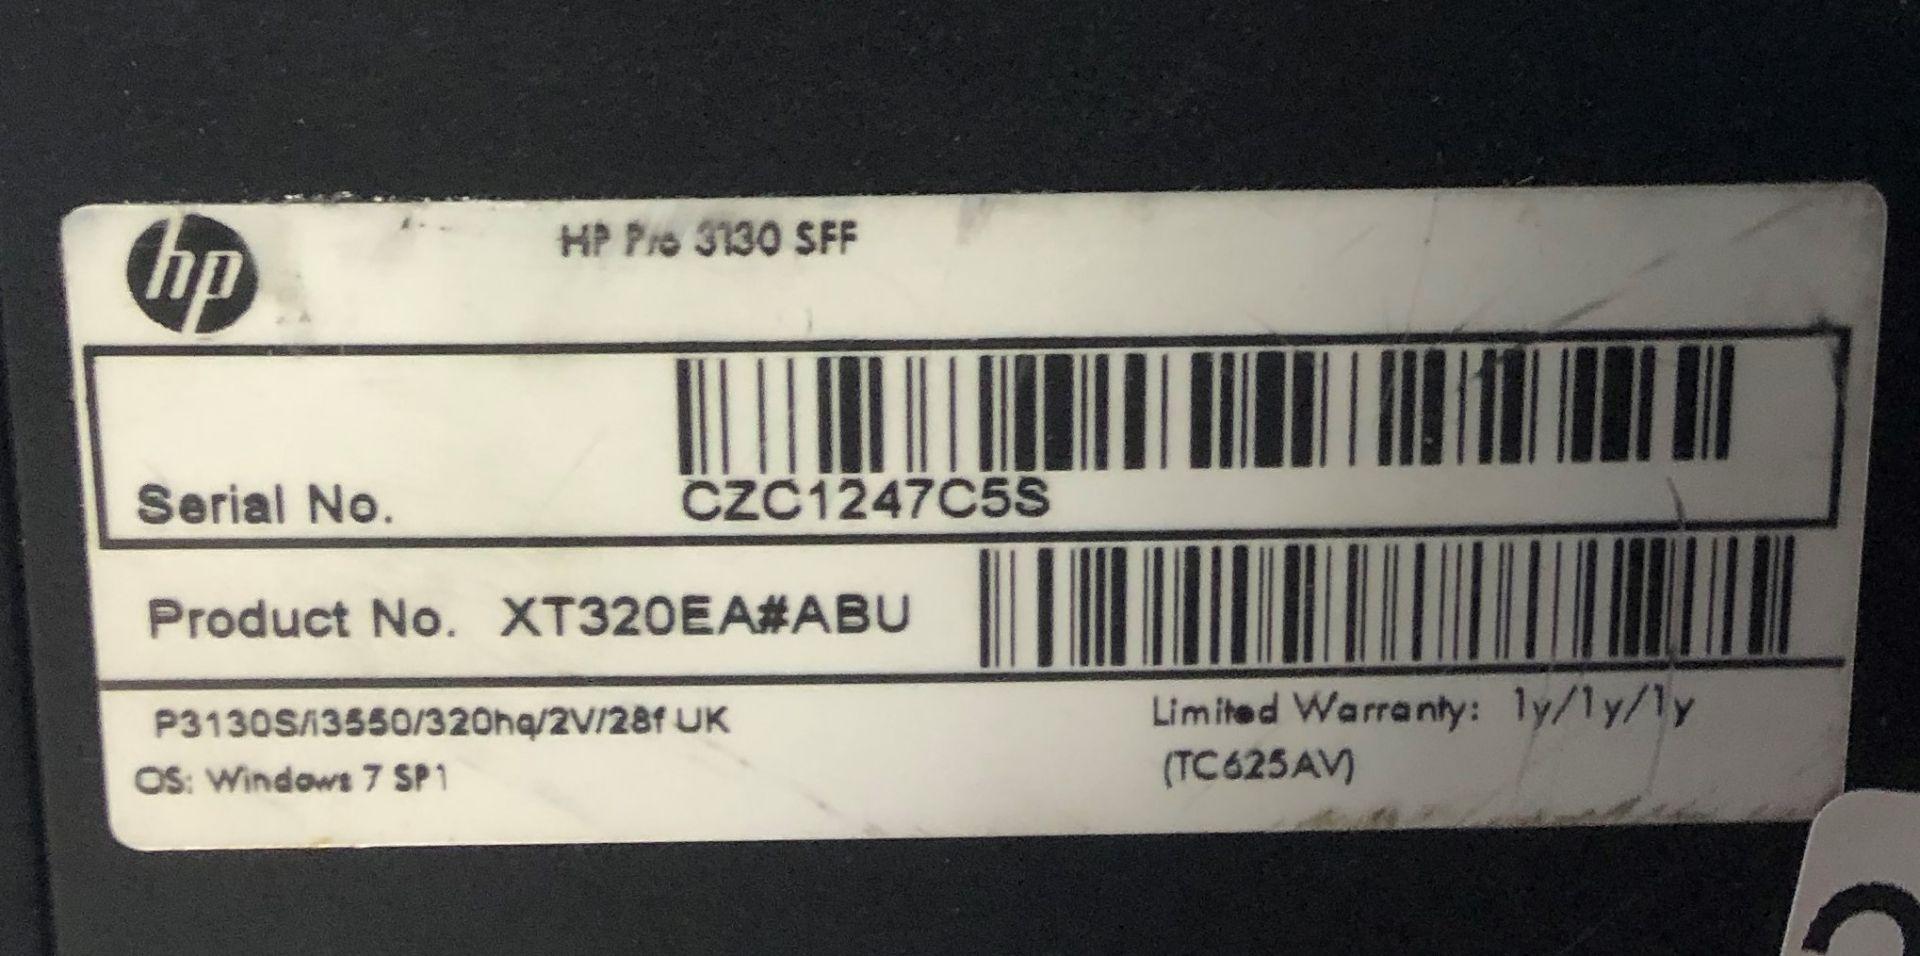 Lot 18 - HP Pro 3130 SFF Desktop Computer